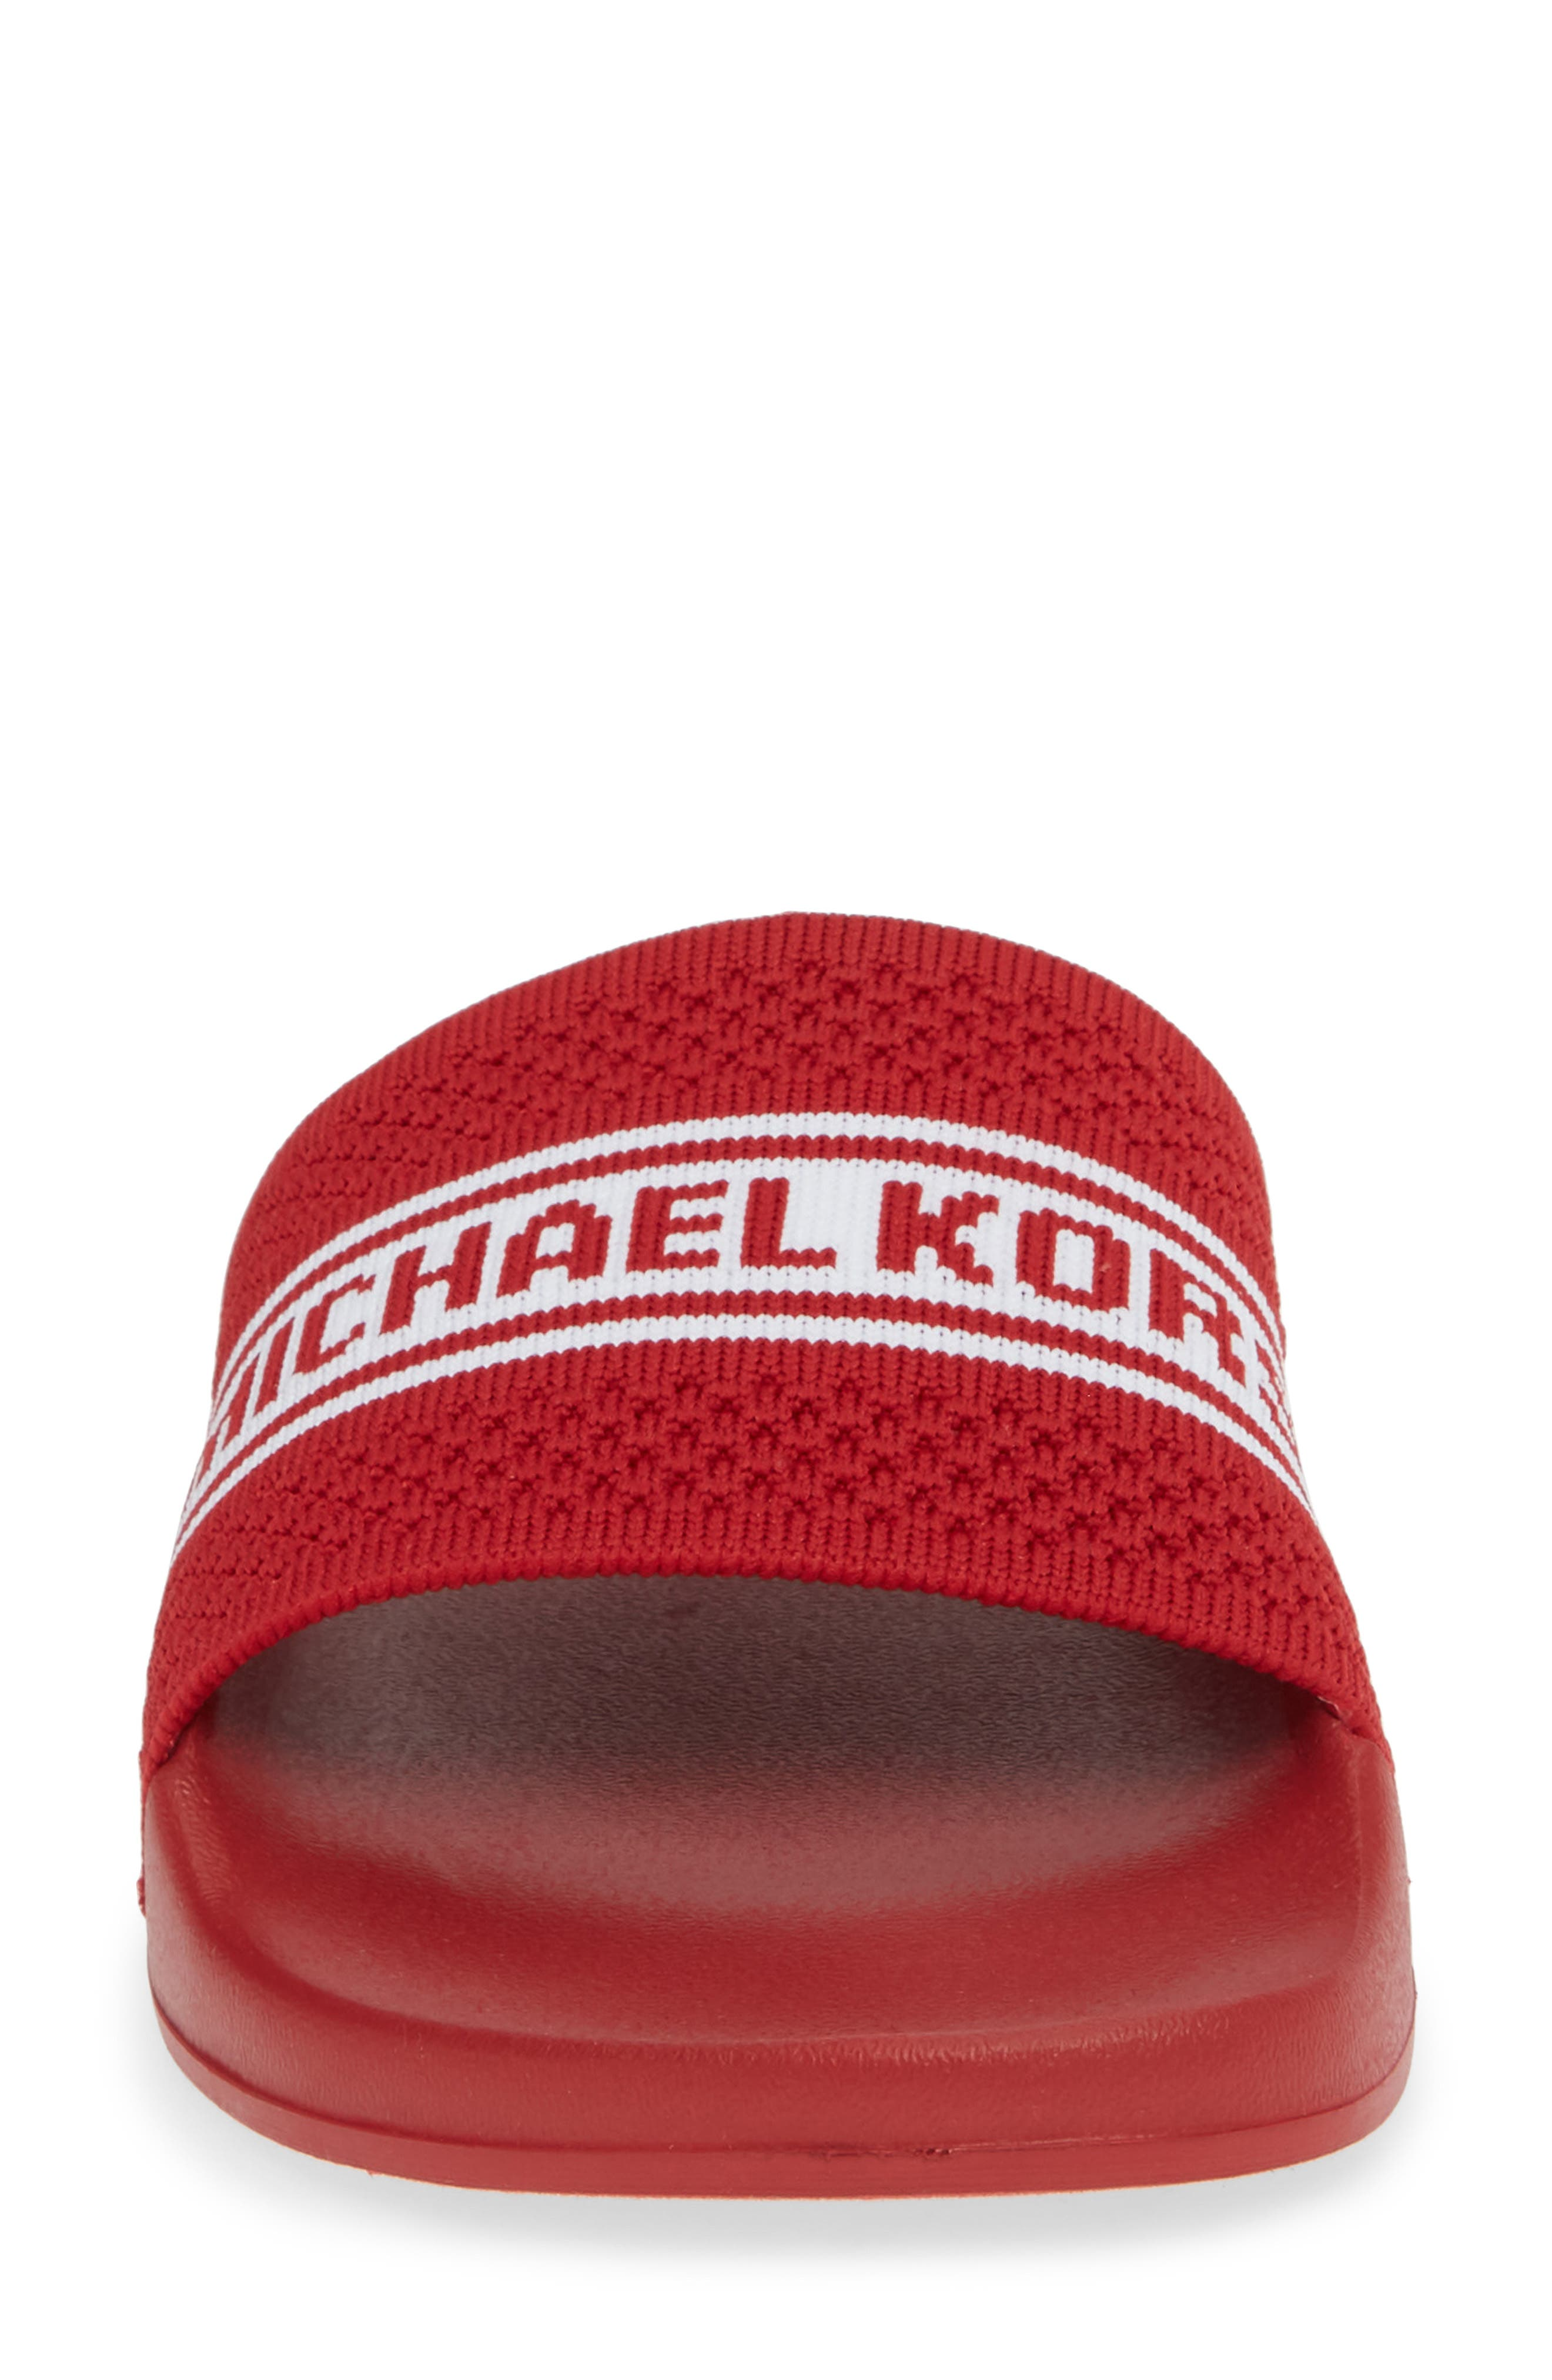 MICHAEL MICHAEL KORS, Gilmore Slide Sandal, Alternate thumbnail 4, color, BRIGHT RED FABRIC